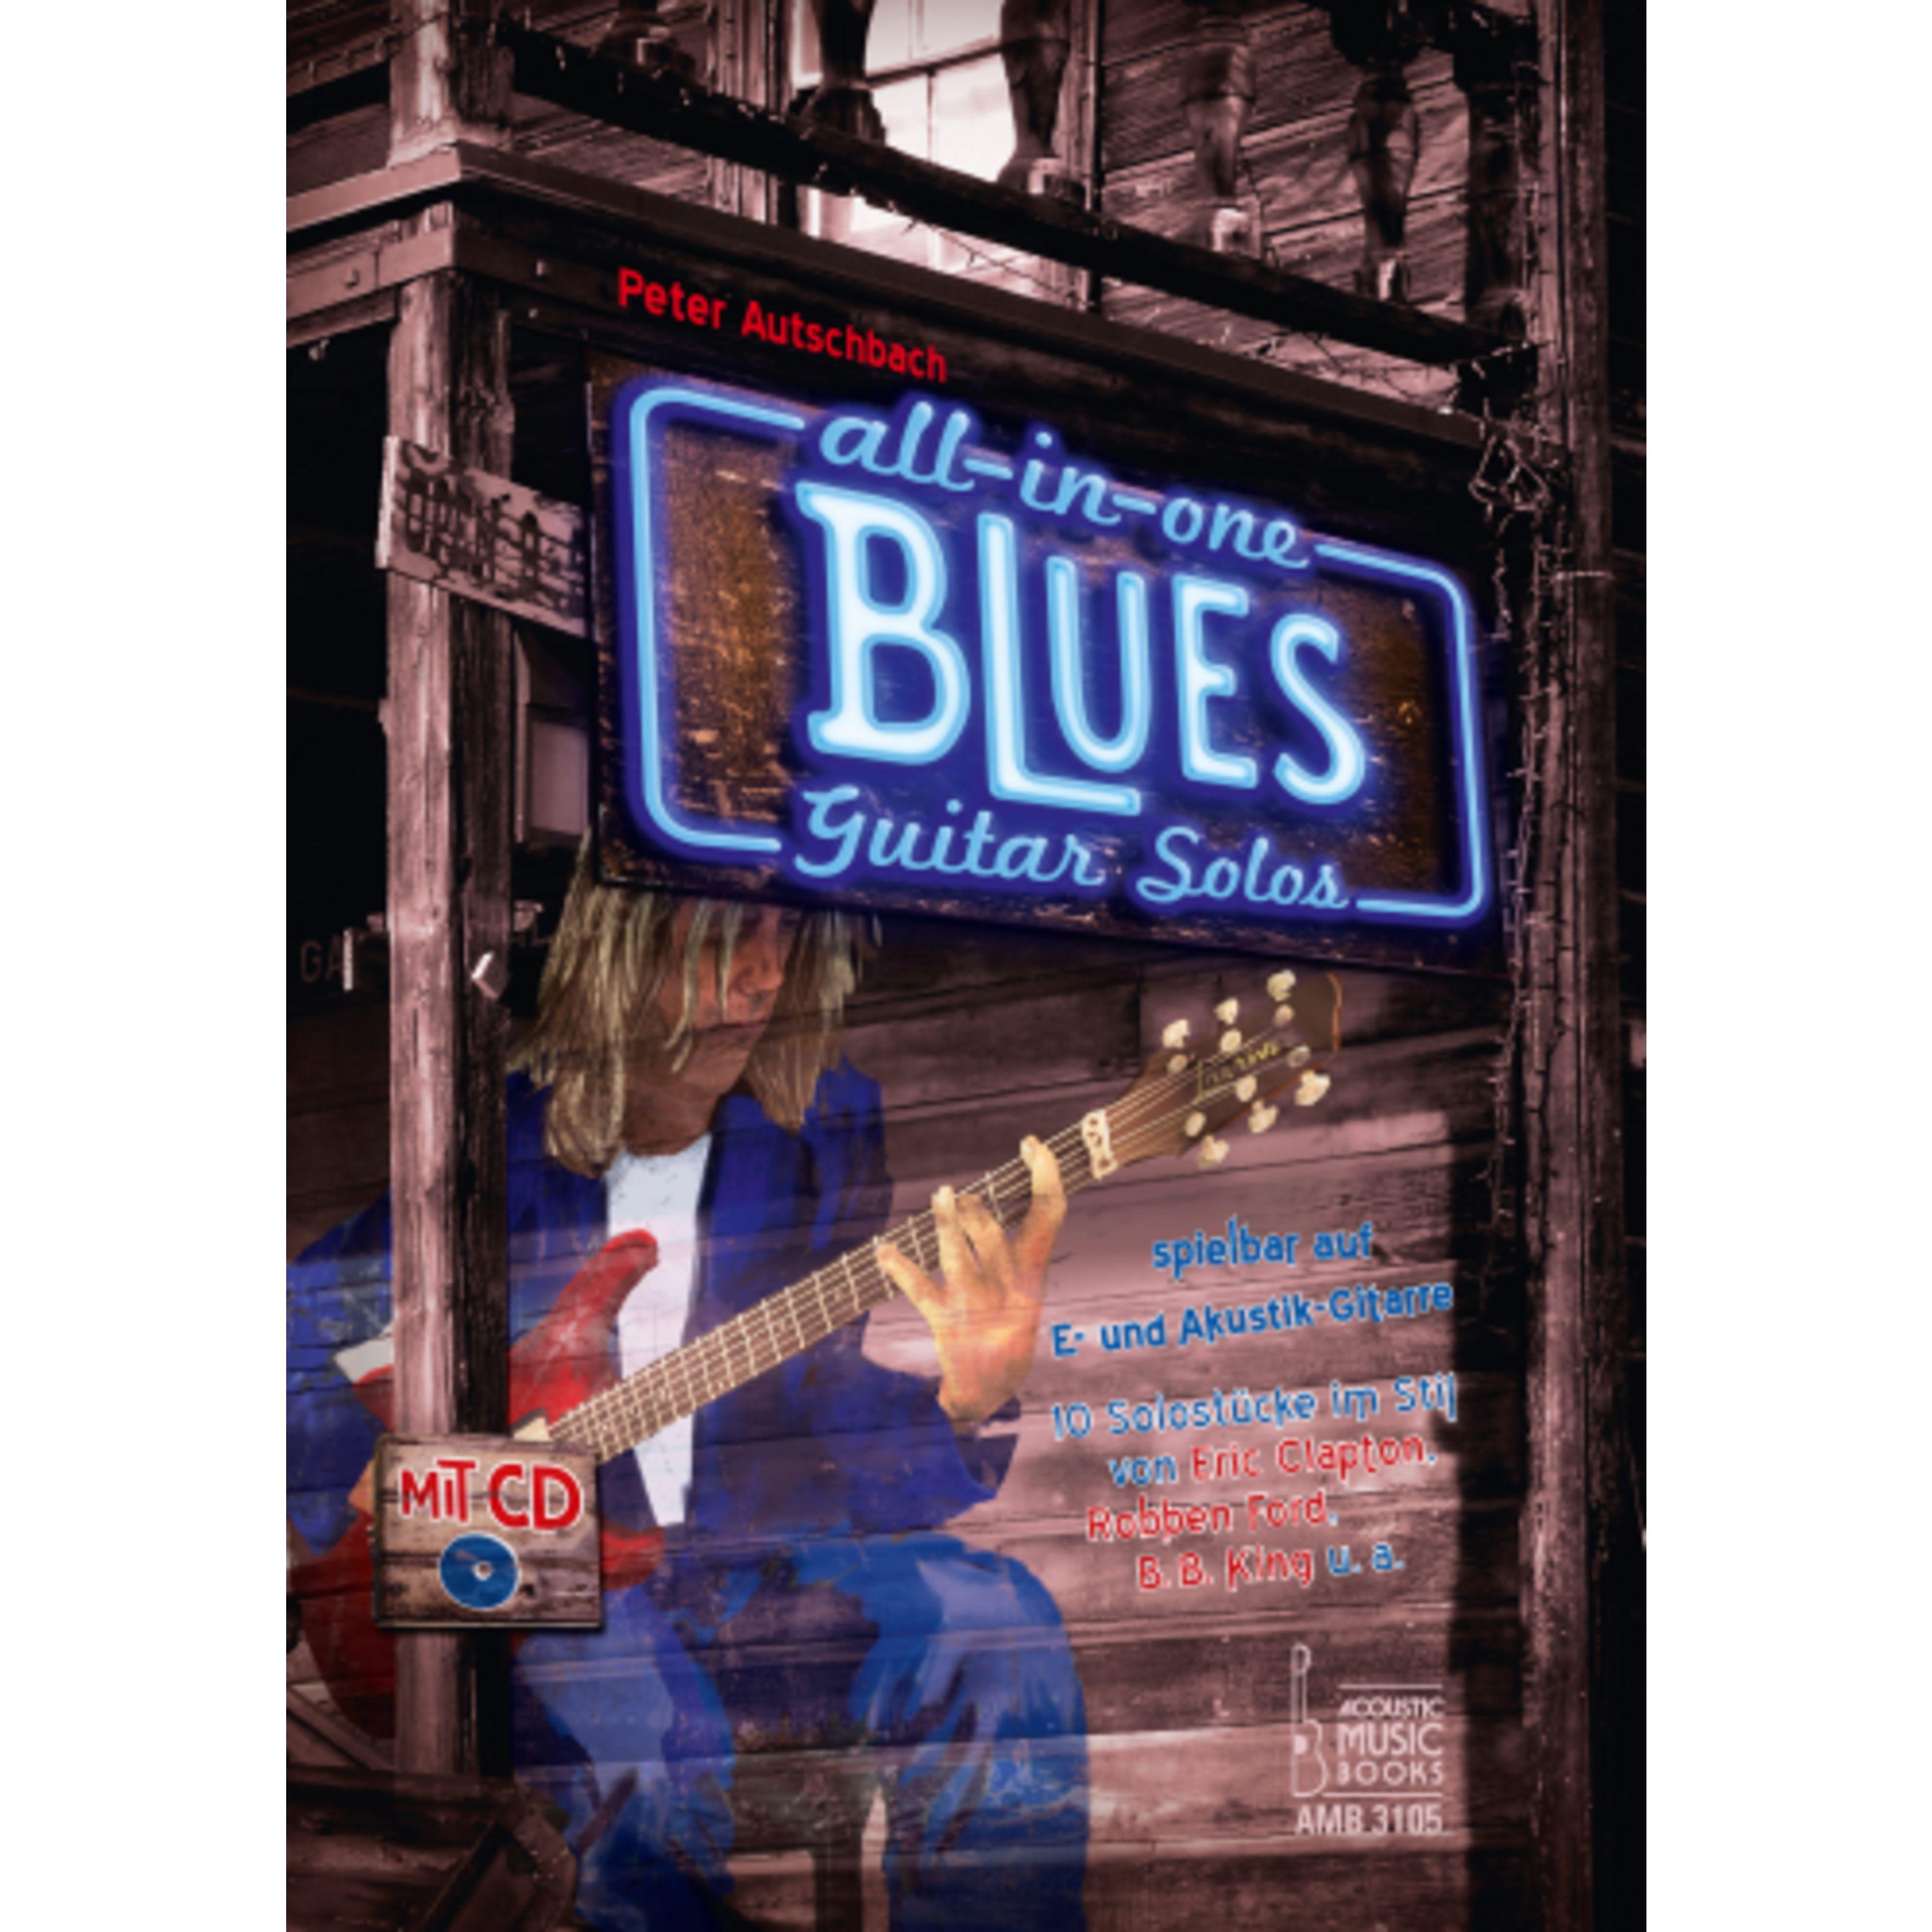 Acoustic Music Books - All in One Blues Guitar Solos für E- und Akustik-Gitarre AMB 3105